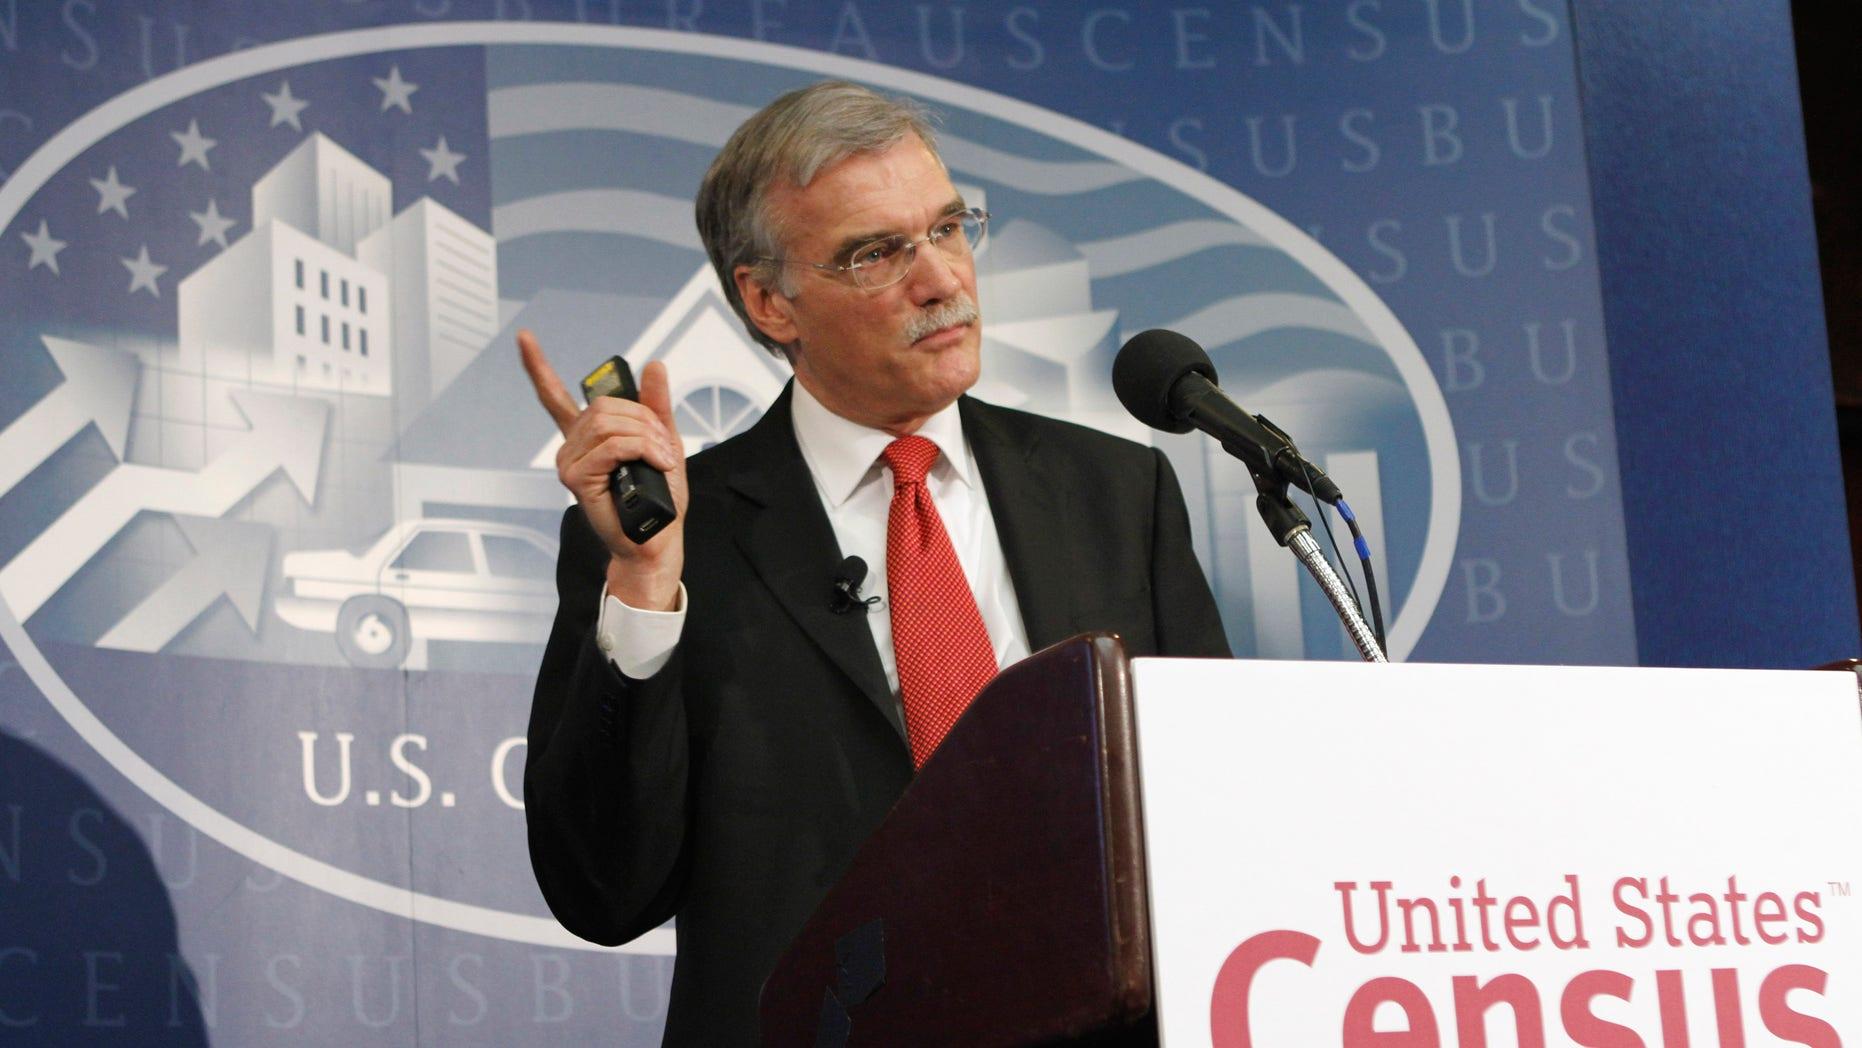 U.S. Census Bureau Director Robert Groves, March 24, 2011. (AP)